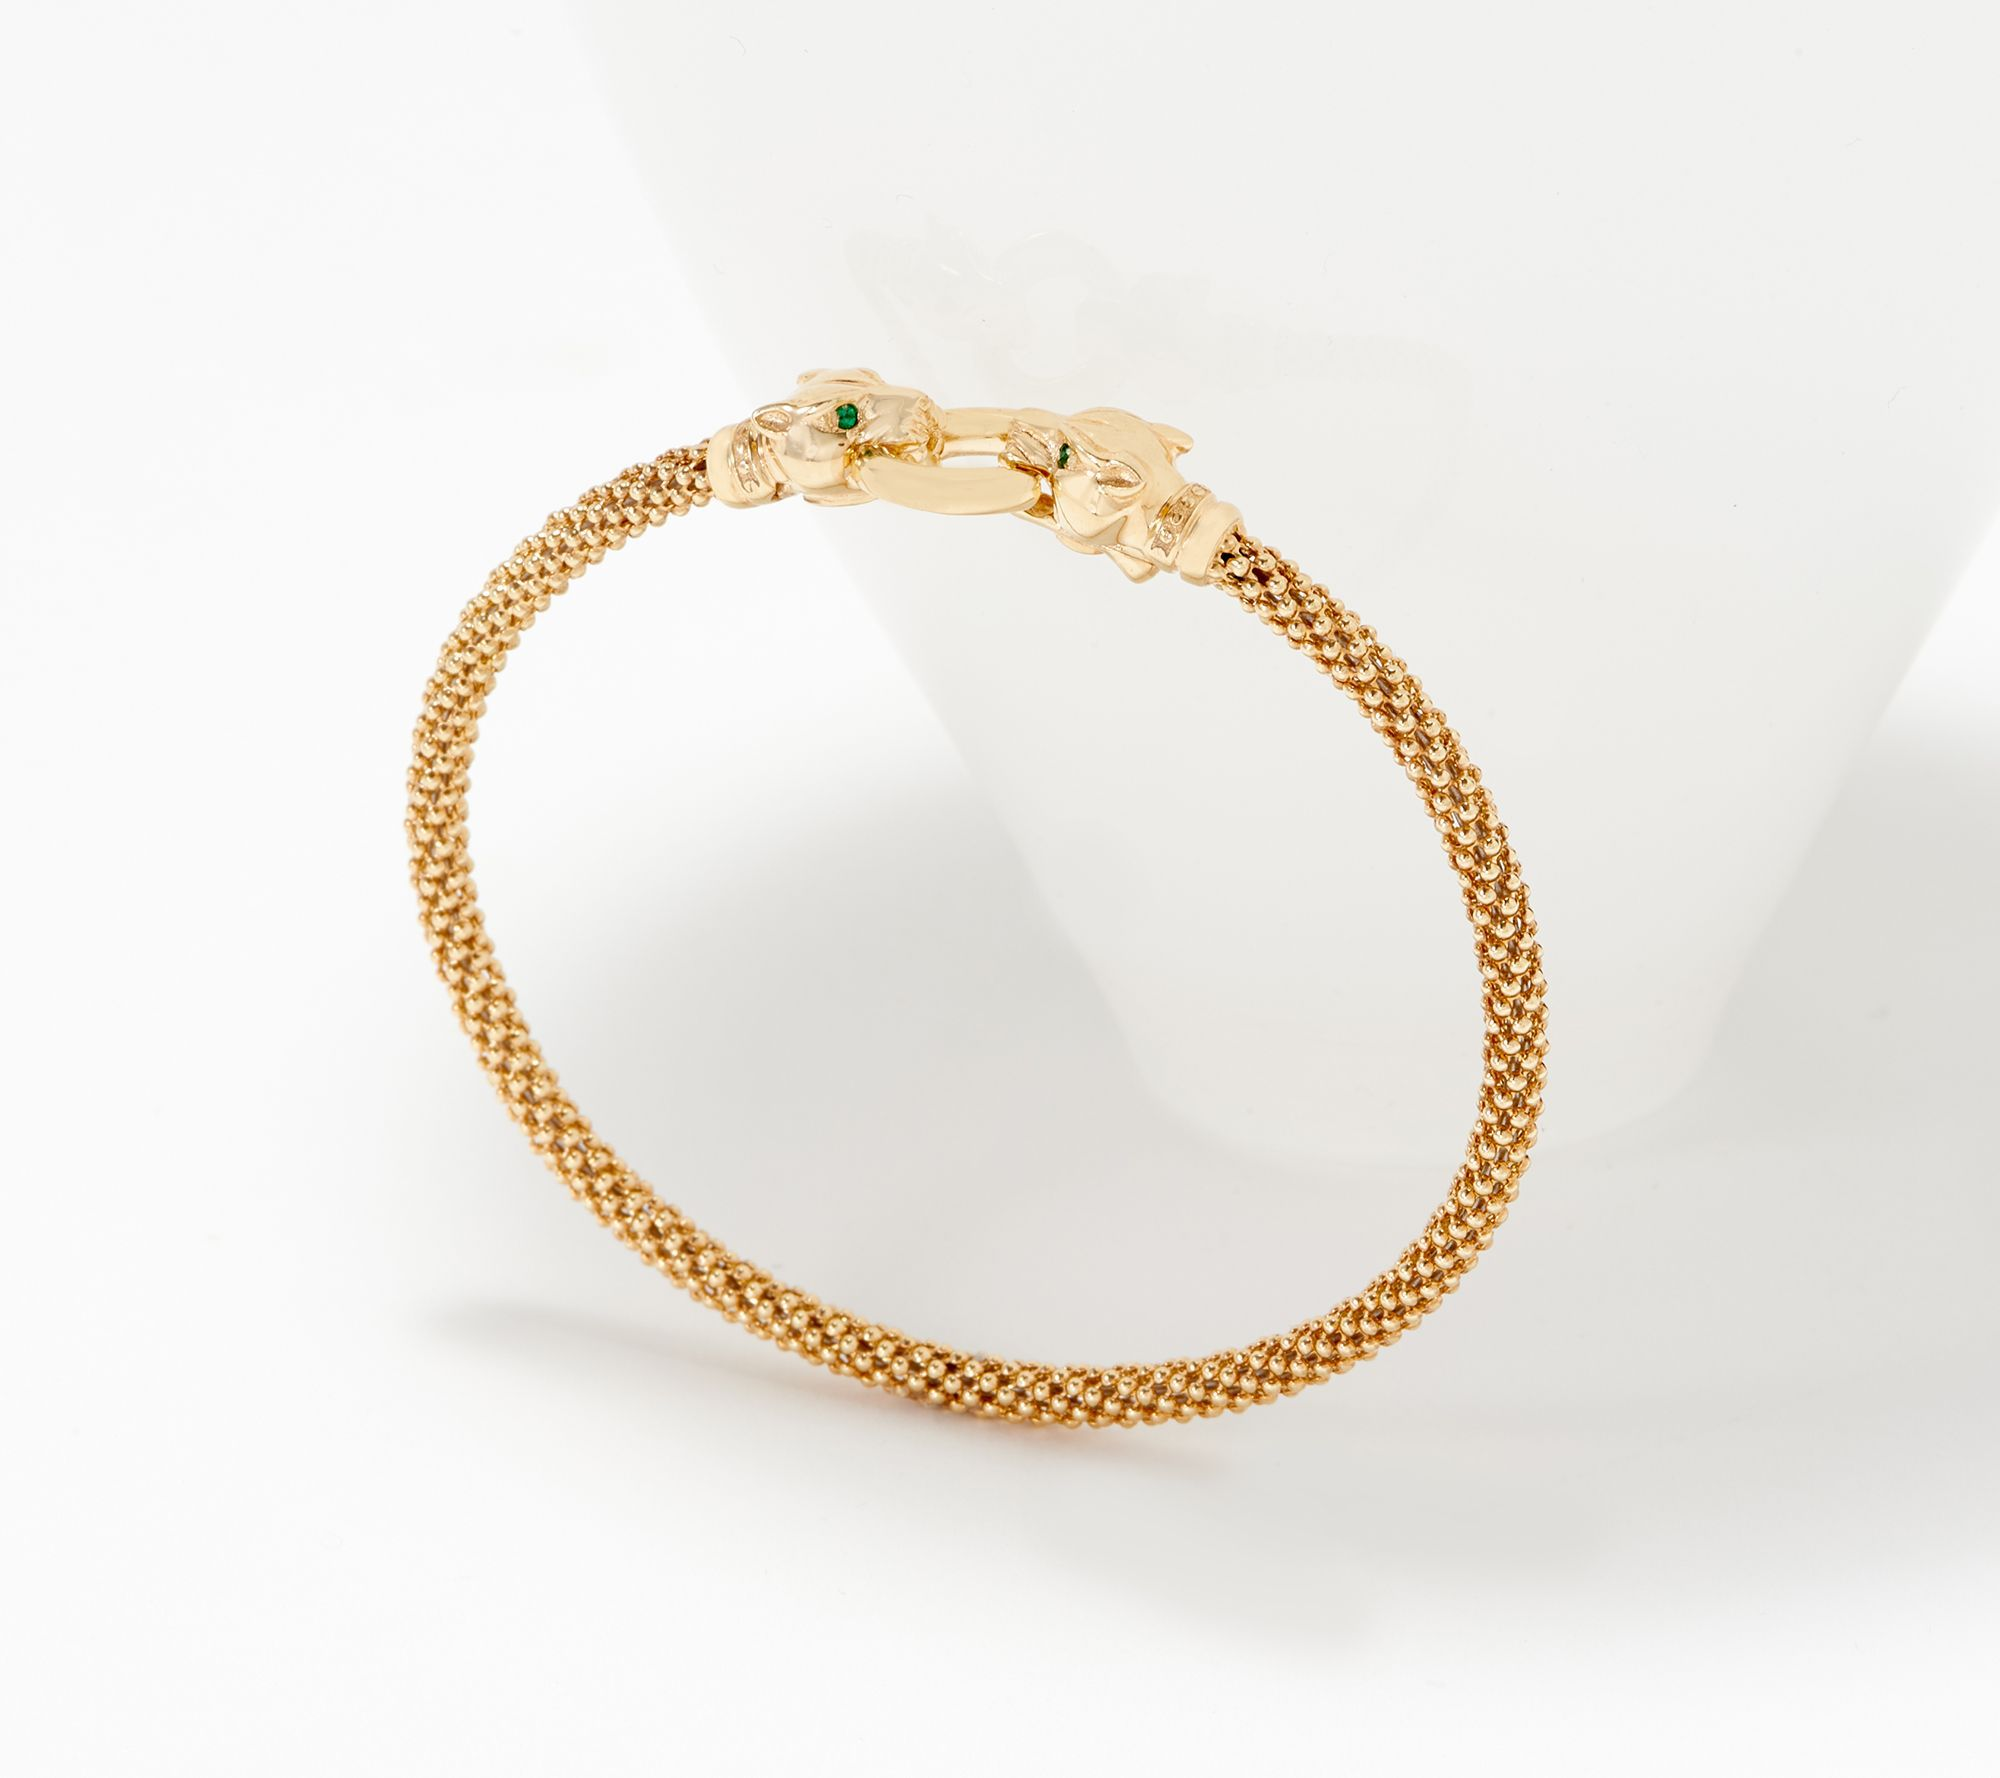 Italian Gold Small Panther Head Bracelet 14k 7 9g Qvc